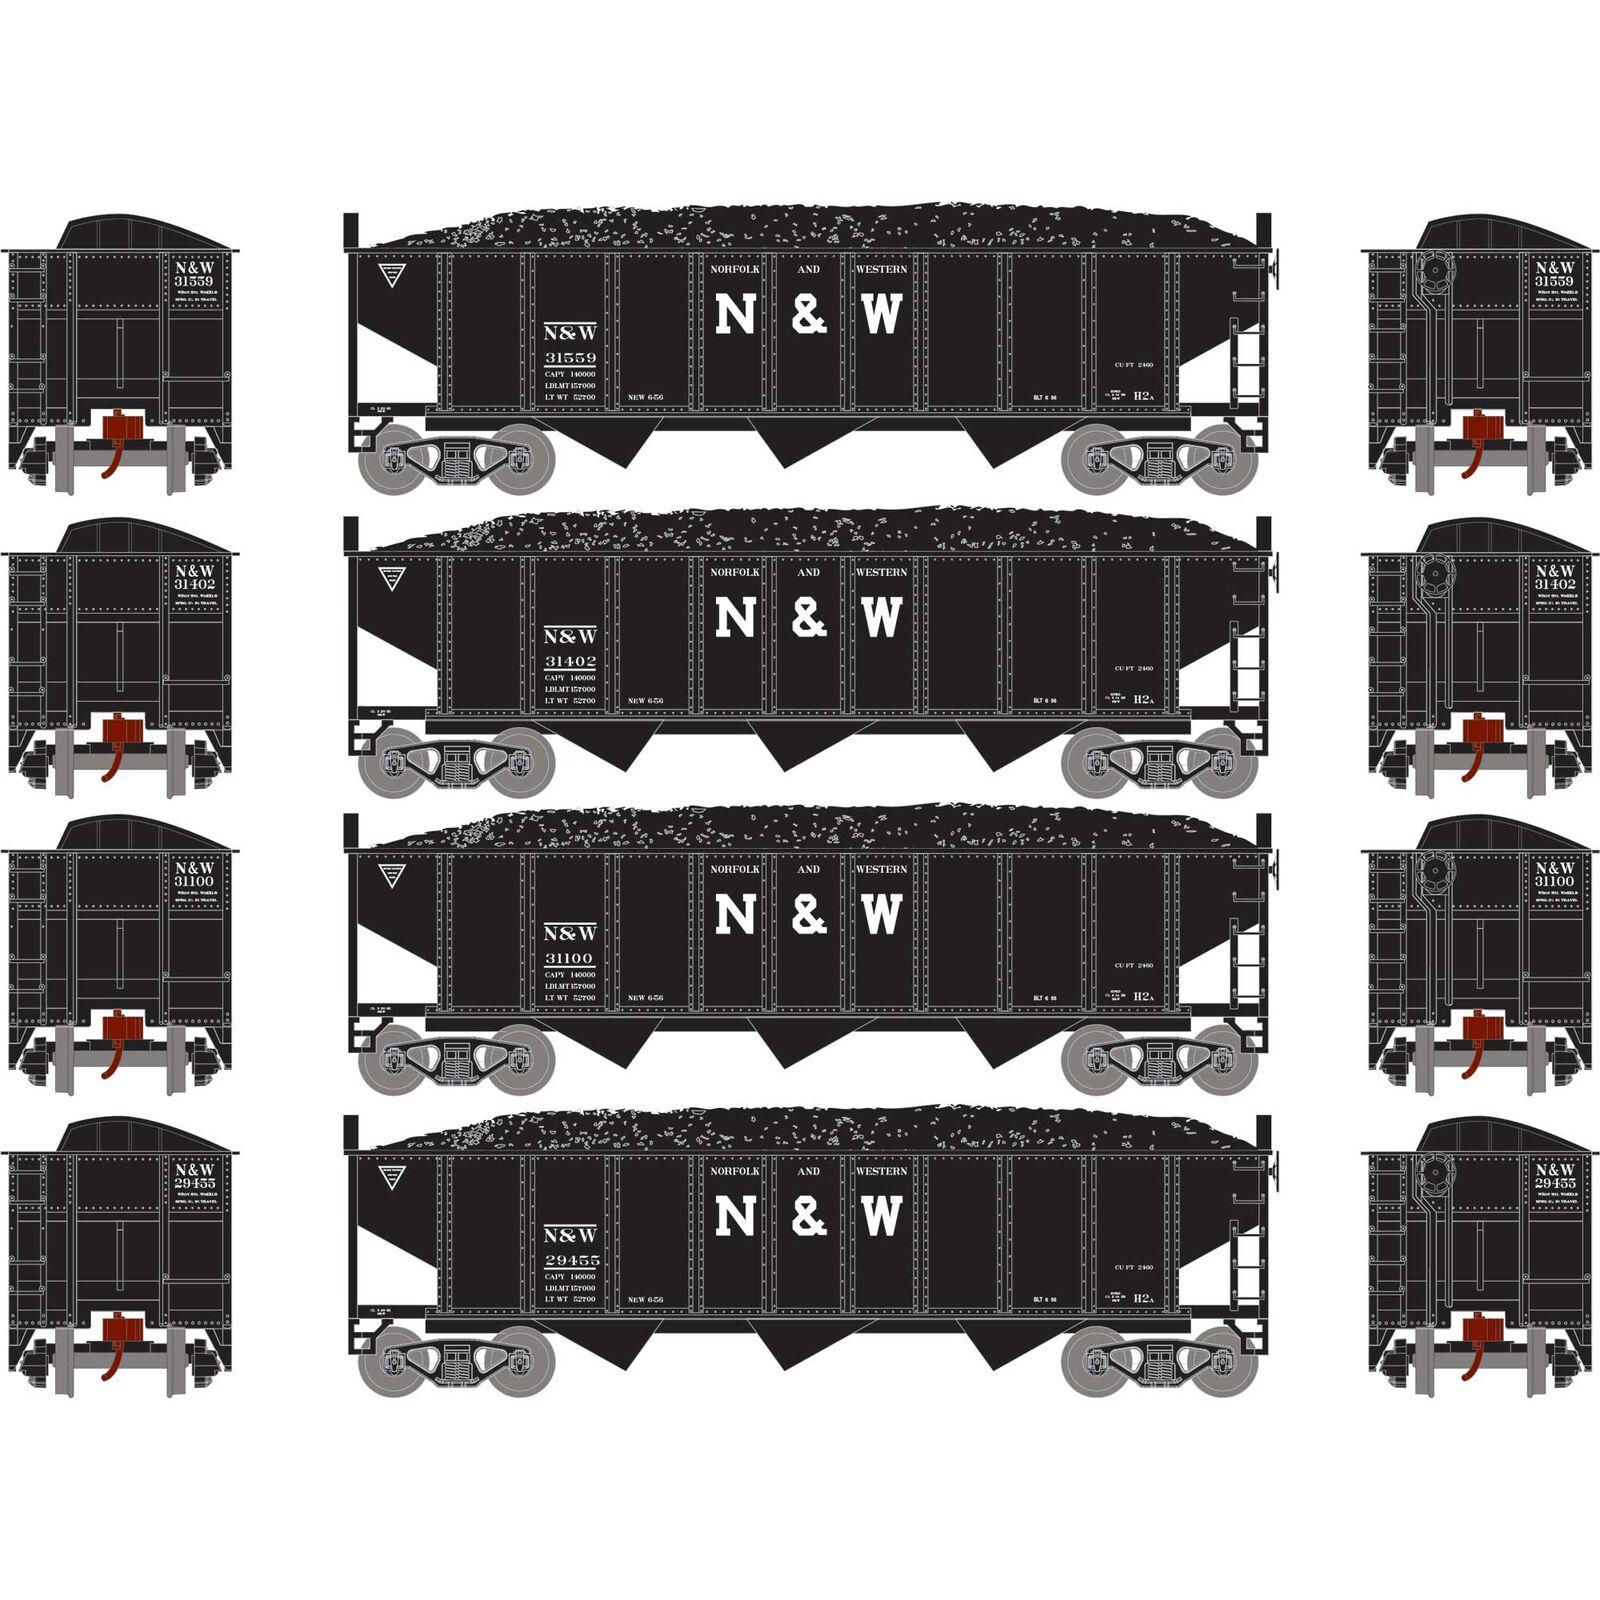 N 40' 3-Bay Ribbed Hopper with Load, N&W #2 (4)